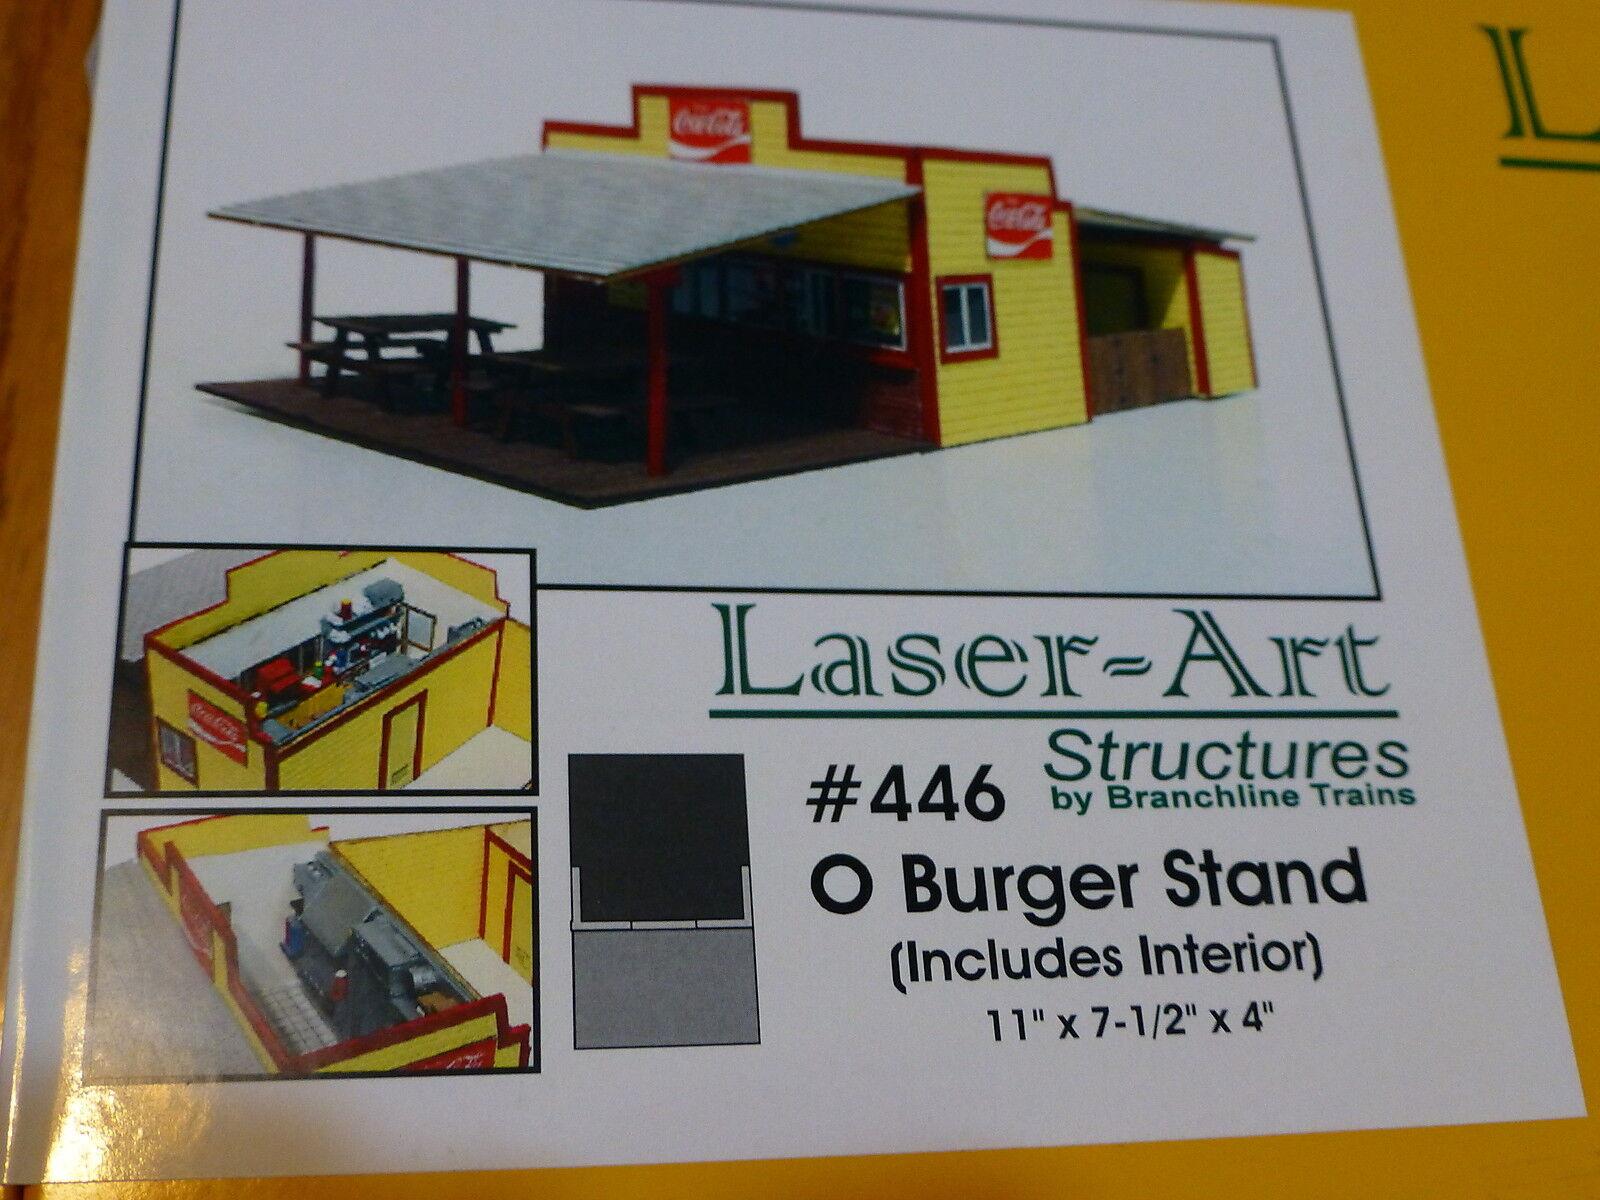 Branchline O  446 Burger Stand Kit  11  x 7-1/2  x 4   Laser-Art